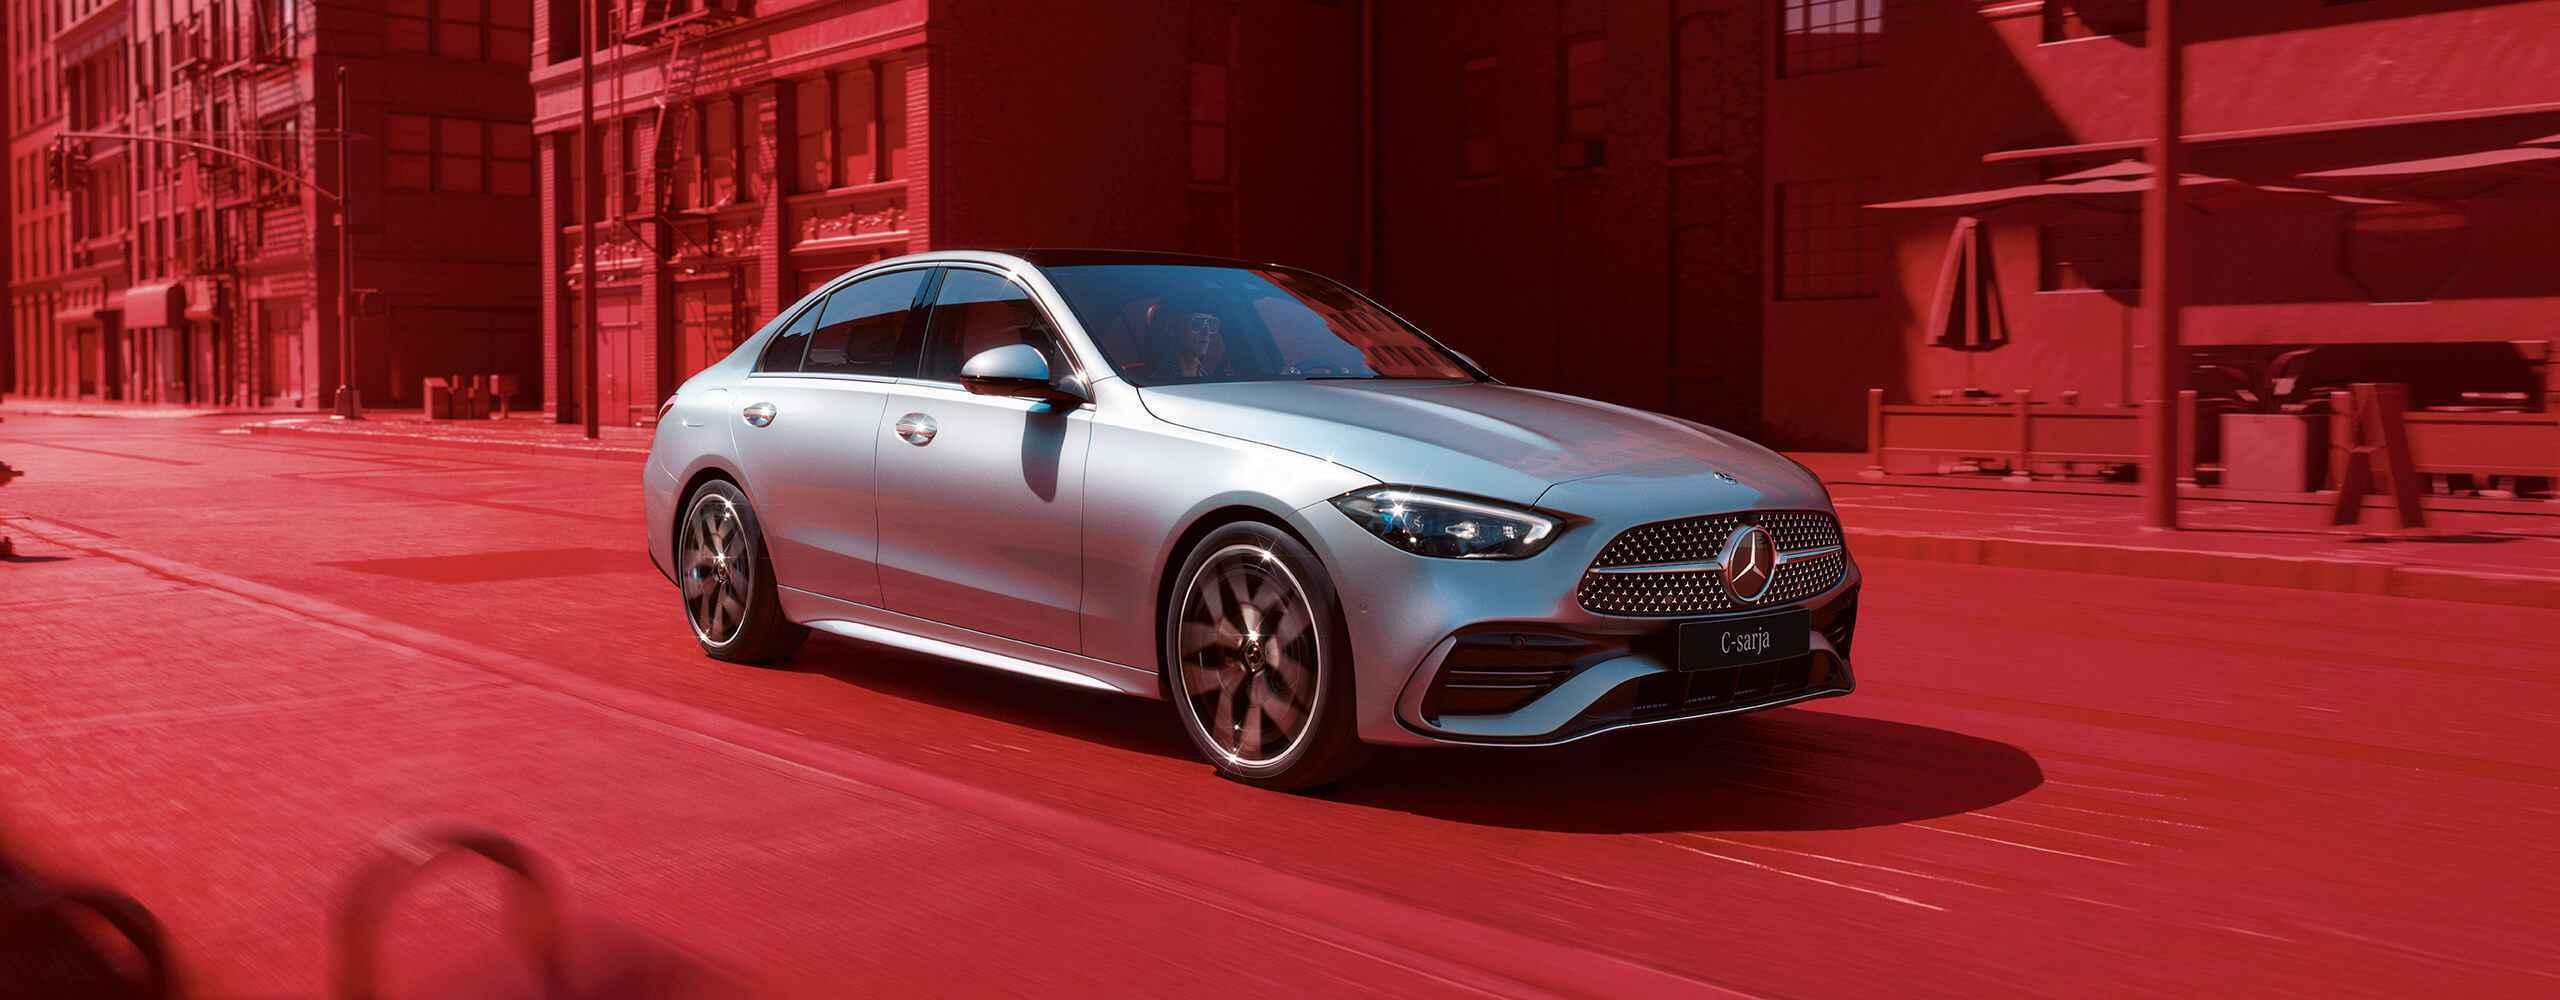 Uusi Mercedes-Benz C-sarja